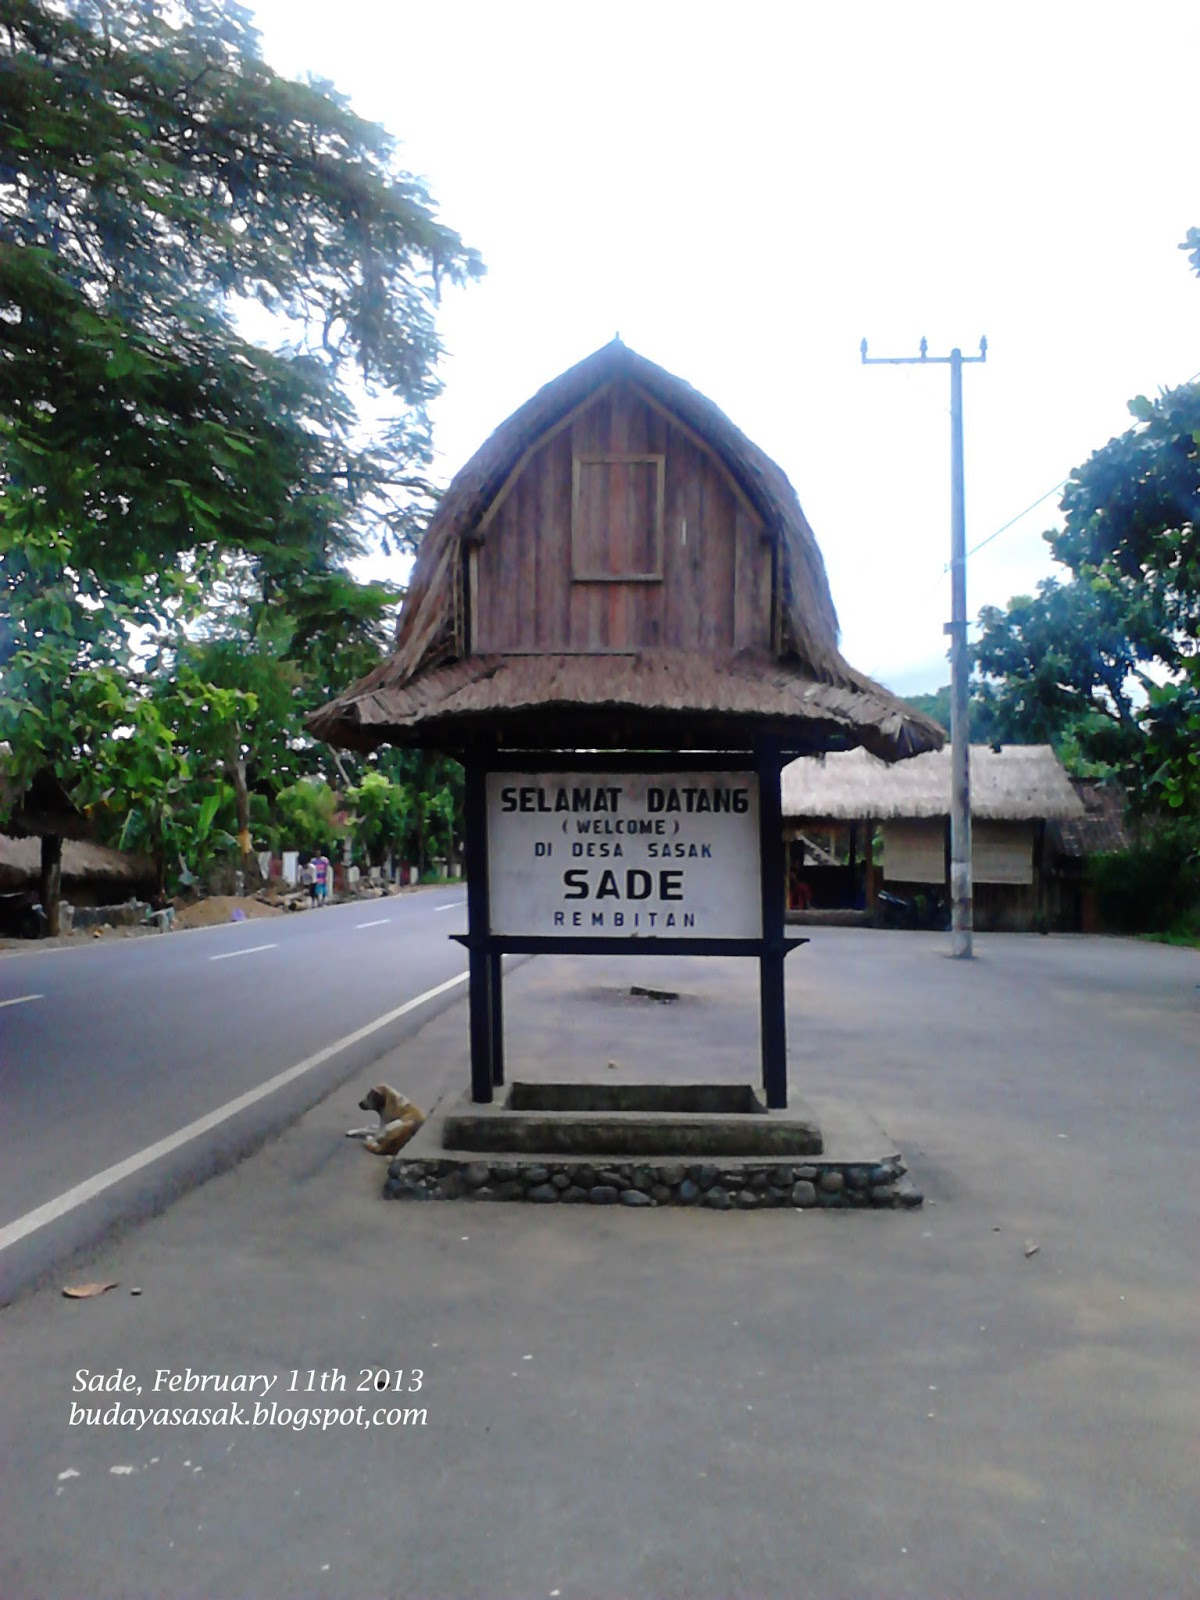 Wisata Rumah Adat Desa Sade Lombok Tour Travel Kab Tengah